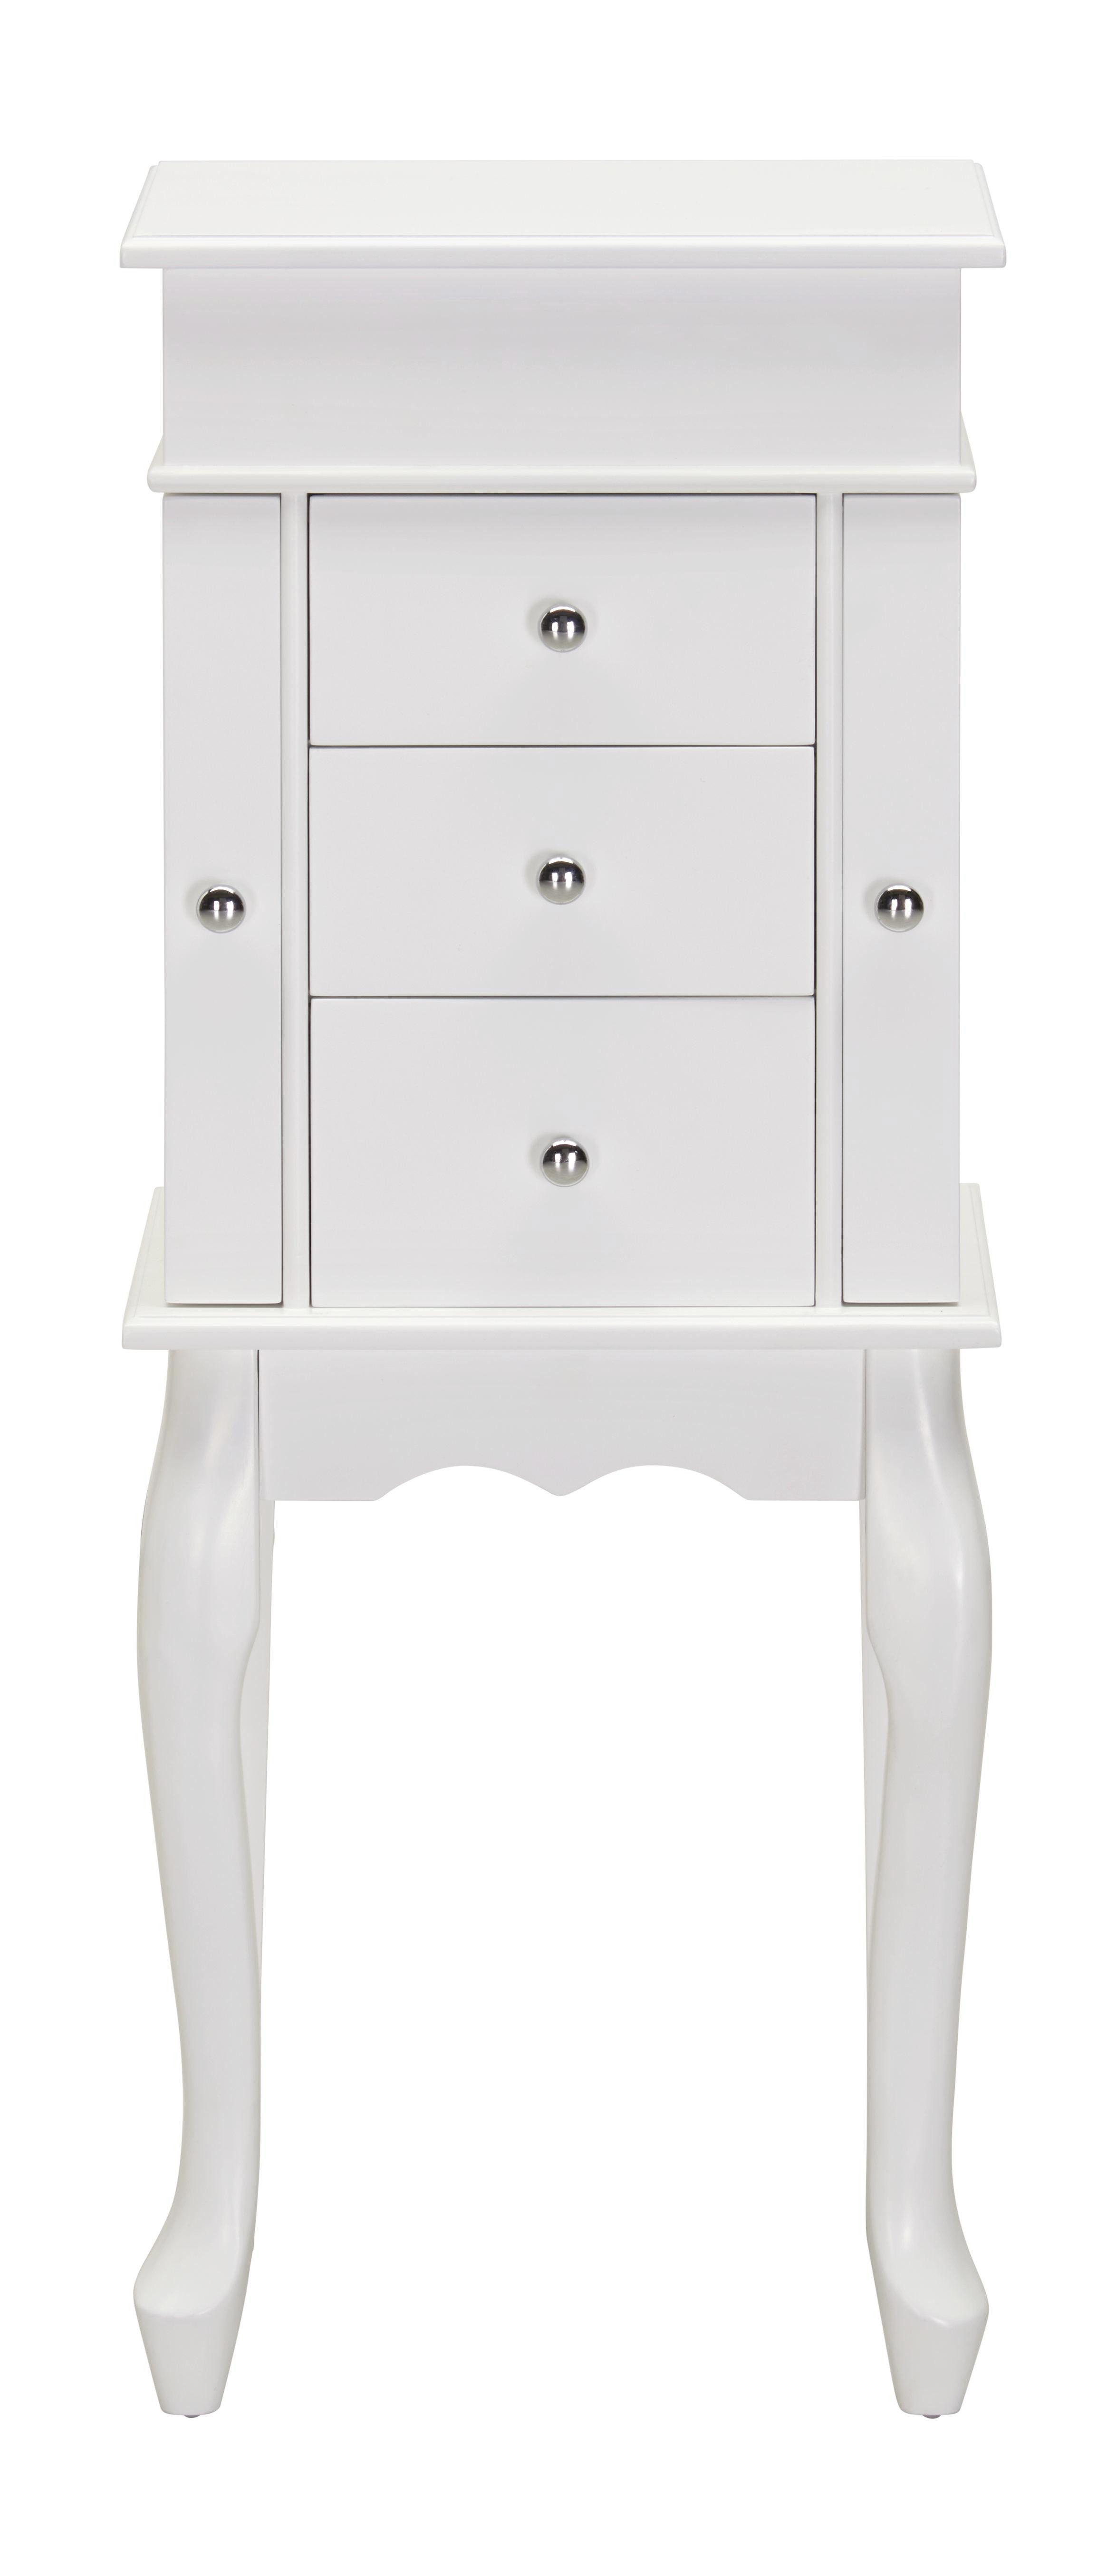 SMYCKESSKÅP - vit/kromfärg, Design, metall/glas (32/84,4/21cm) - Xora